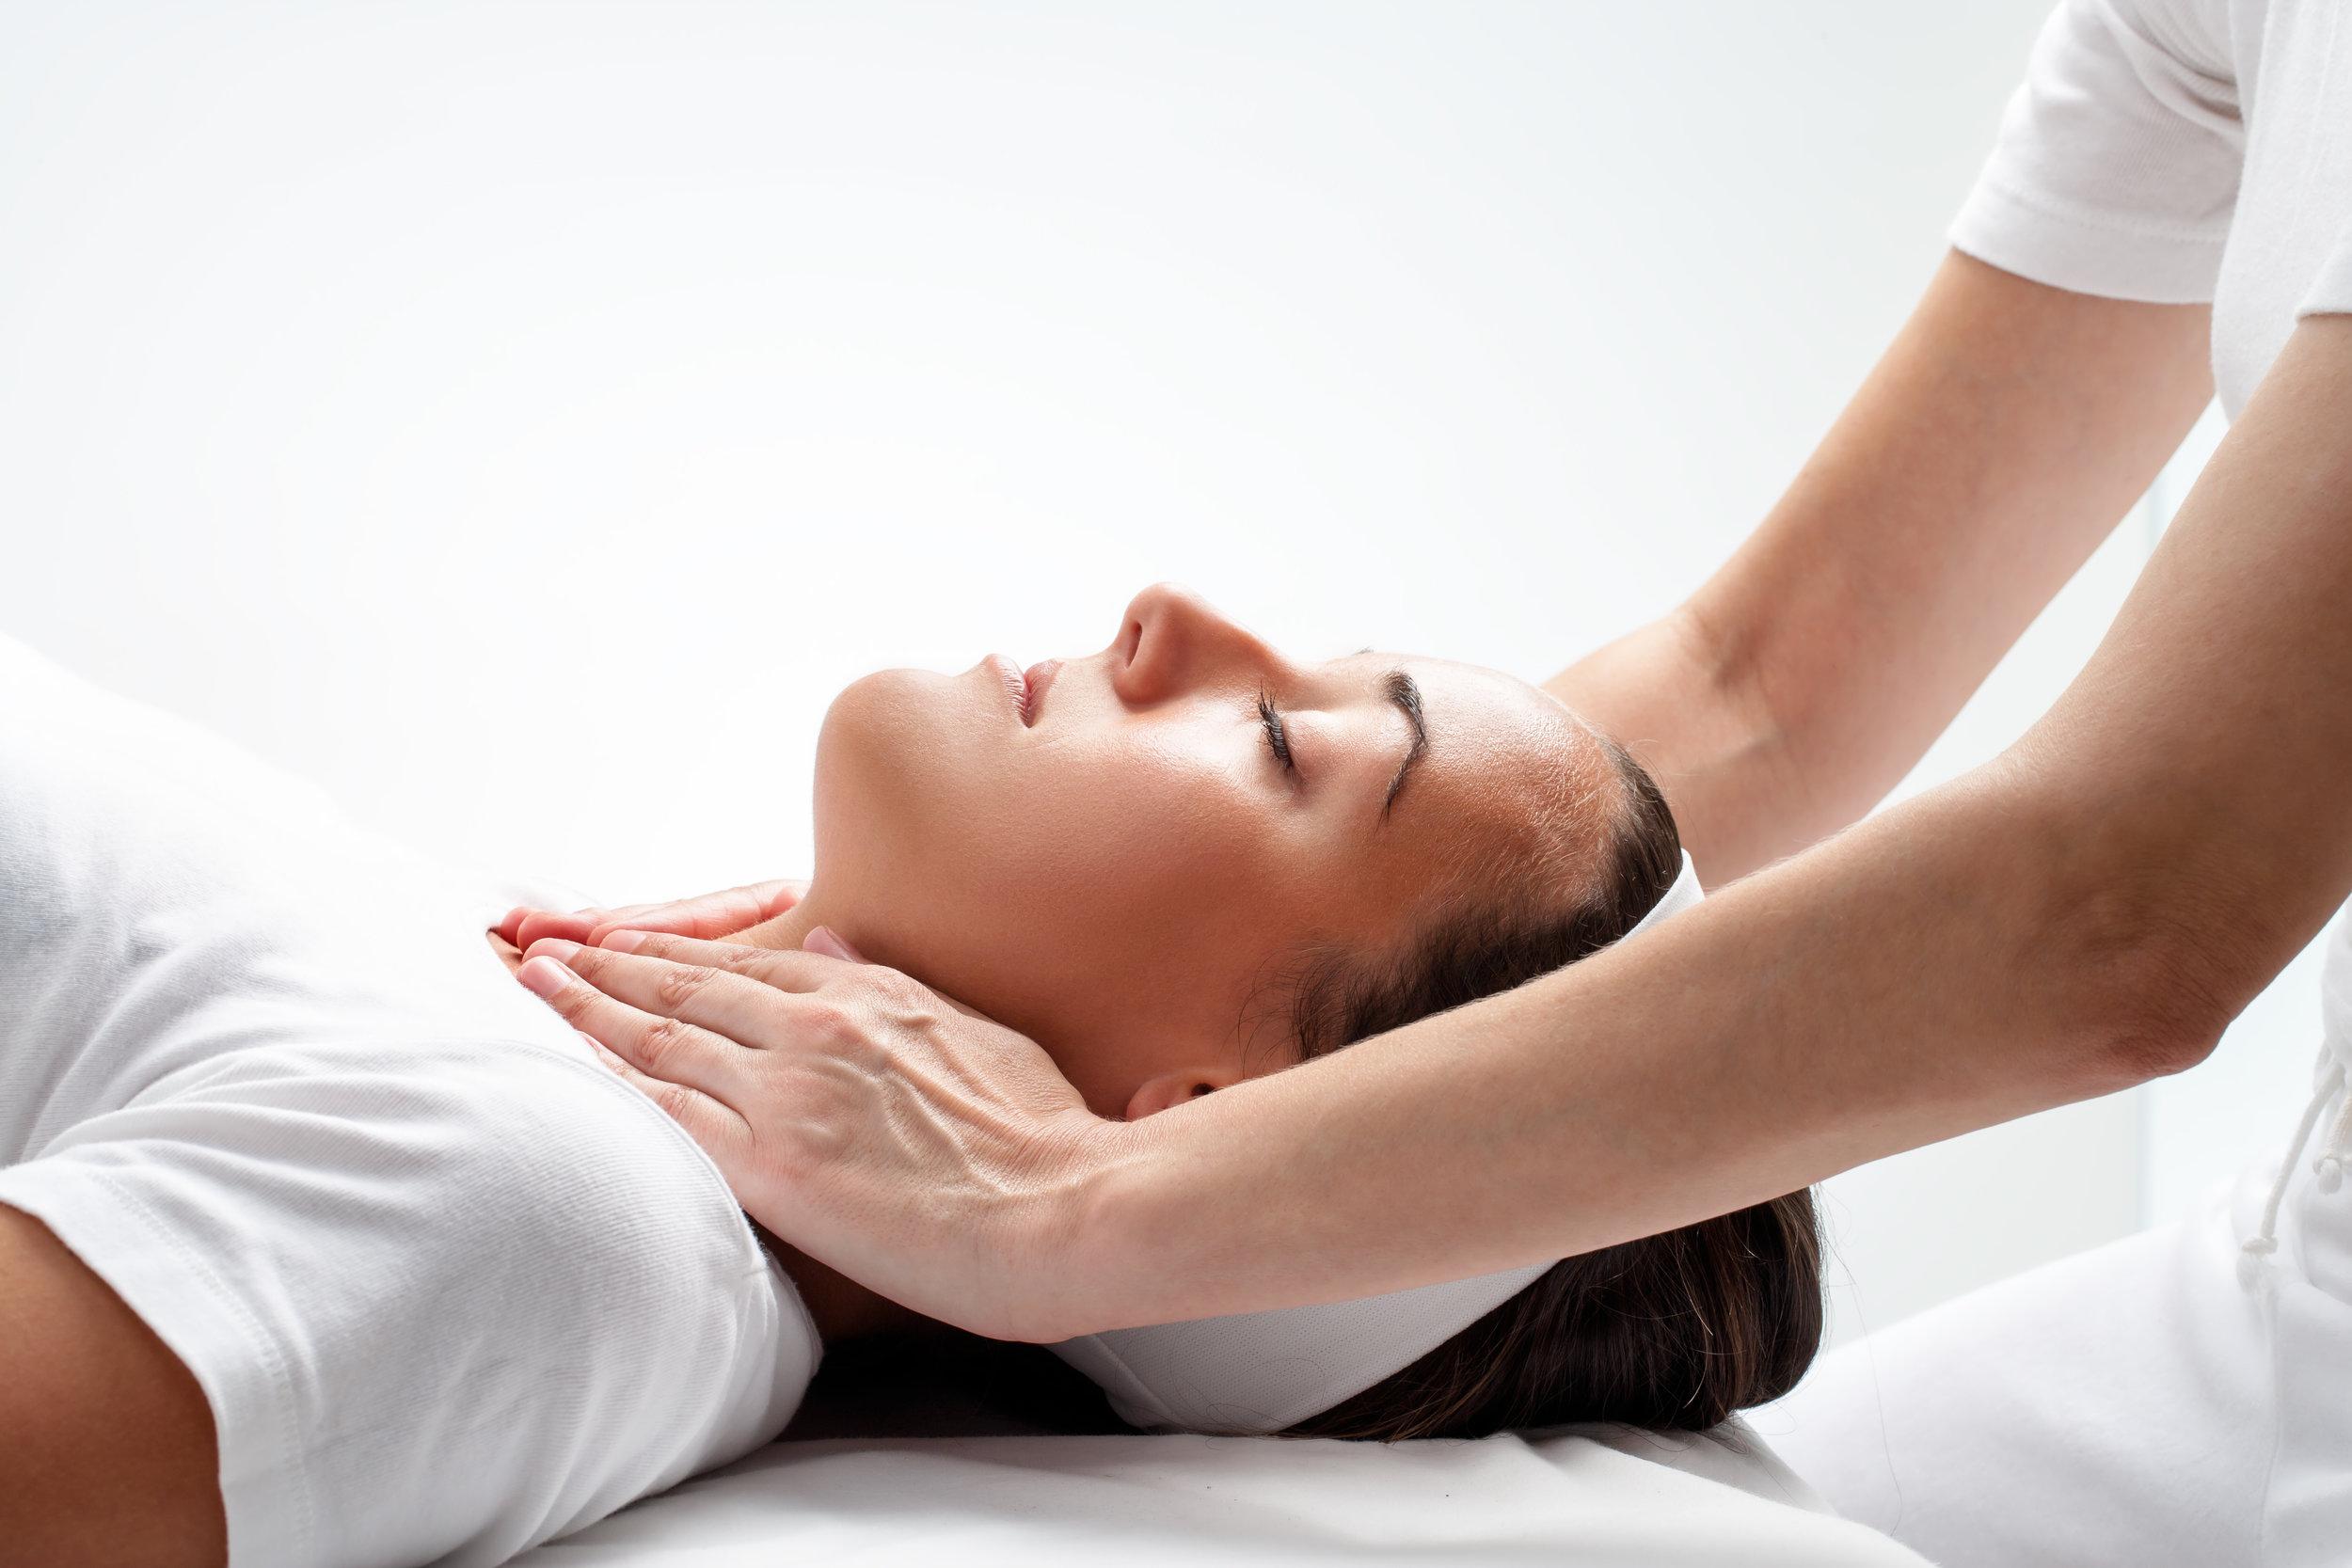 Therapist doing reiki on woman's neck.